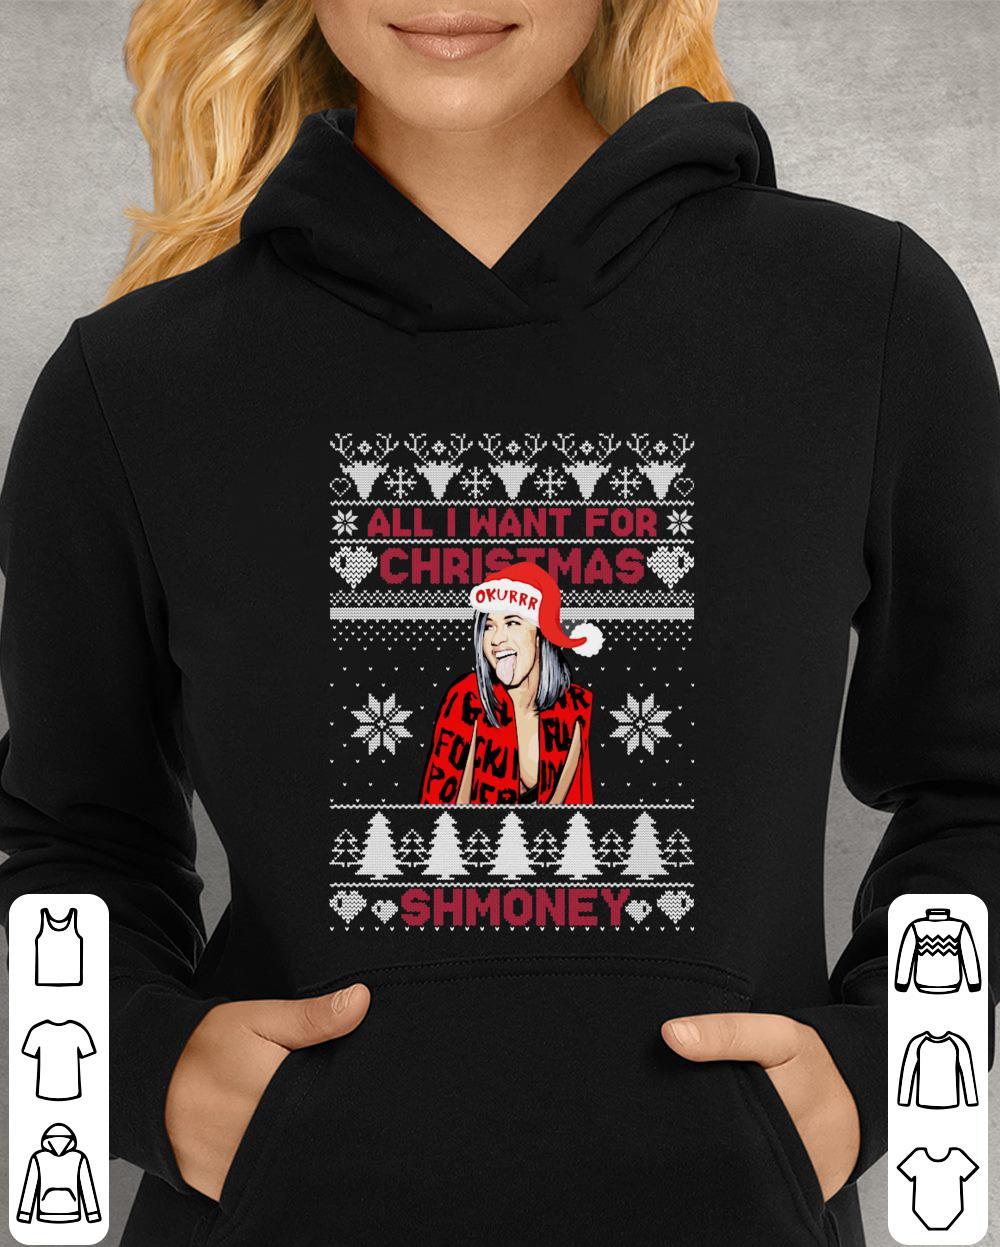 https://unicornshirts.net/images/2018/12/Cardi-B-All-i-want-for-christmas-is-shmoney-shirt_4.jpg